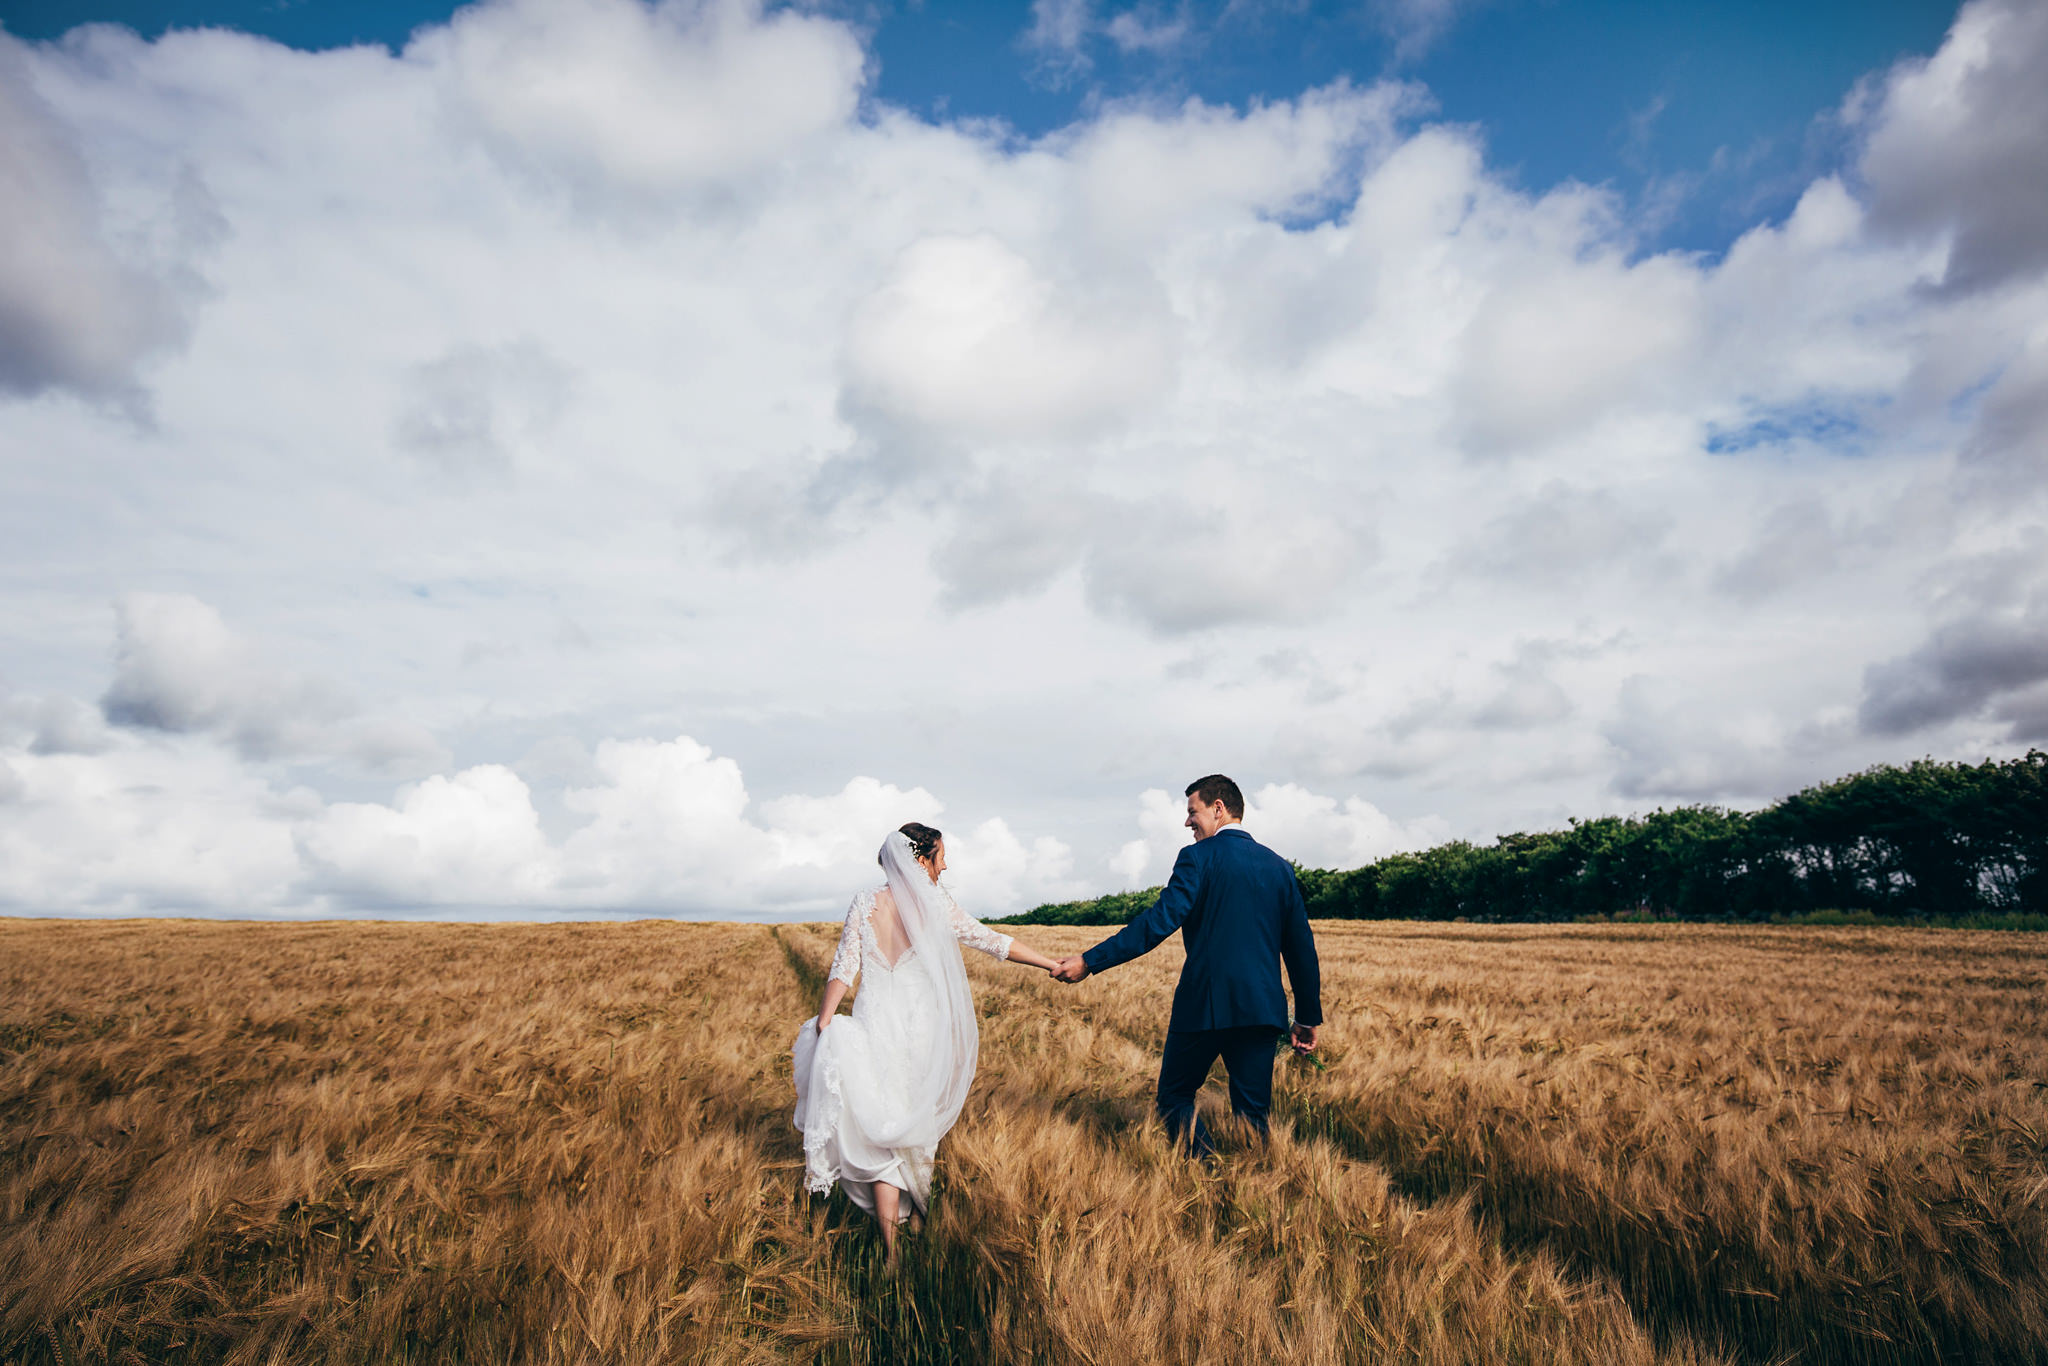 Norway+wedding+photographer+elopement+pre+wedding+Casey+Arneson-88.jpg